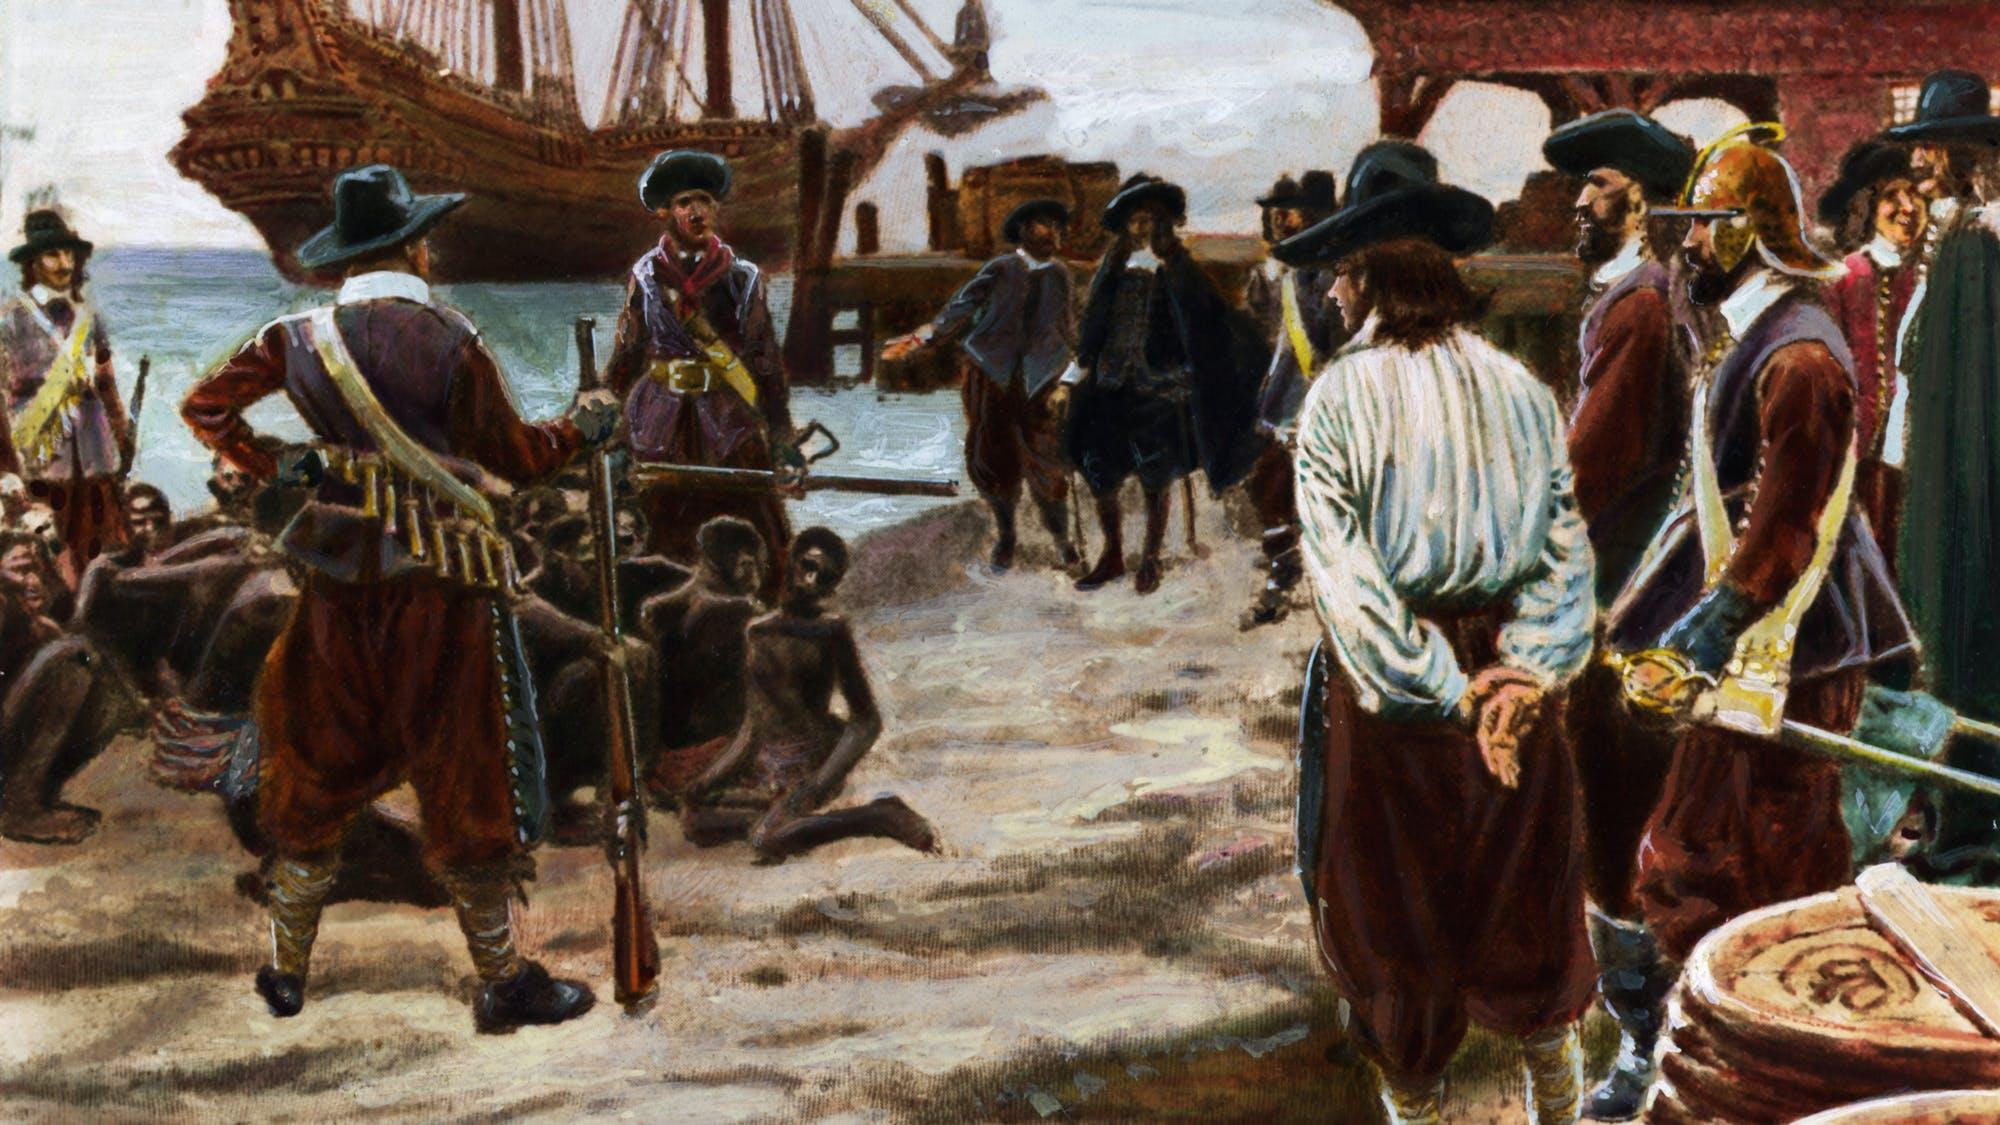 https www.history.com .image MTY2MTY5ODE3MjIzNTM4NjM1 slavery gettyimages 517443610